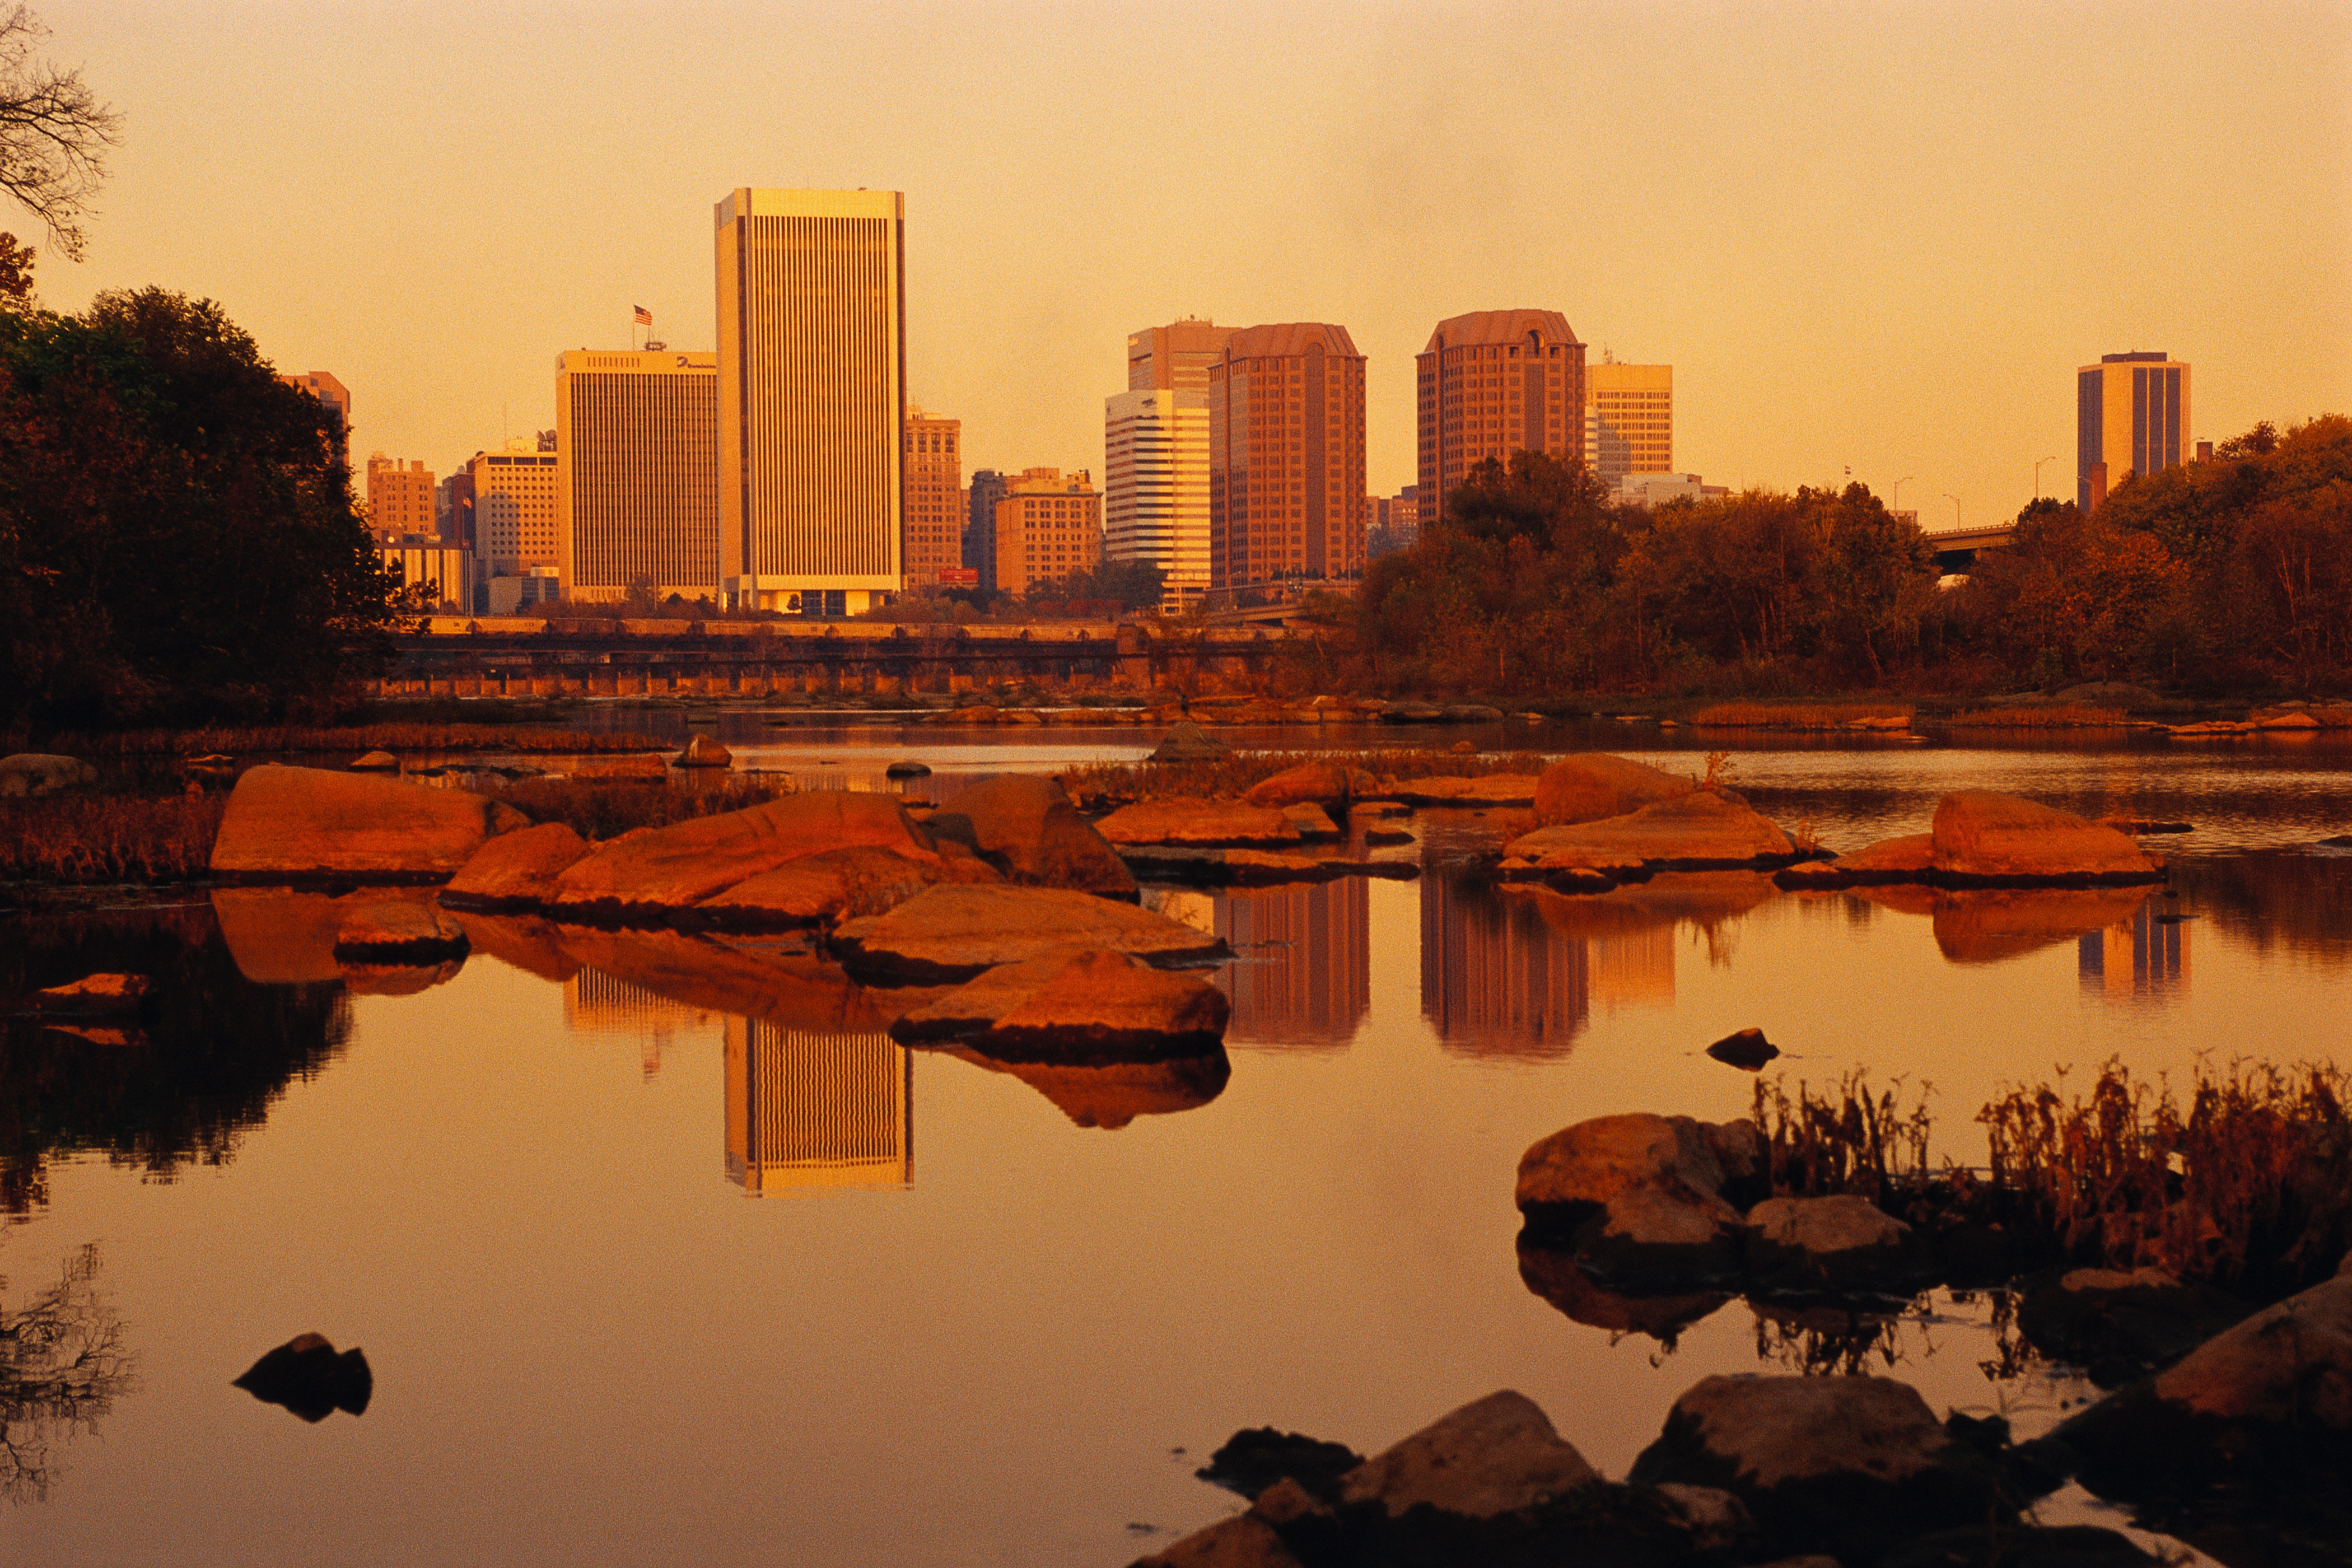 City Of Richmond Va >> autumn-in-shenandoah-national-park-2 - Virginia Pictures - Virginia - HISTORY.com